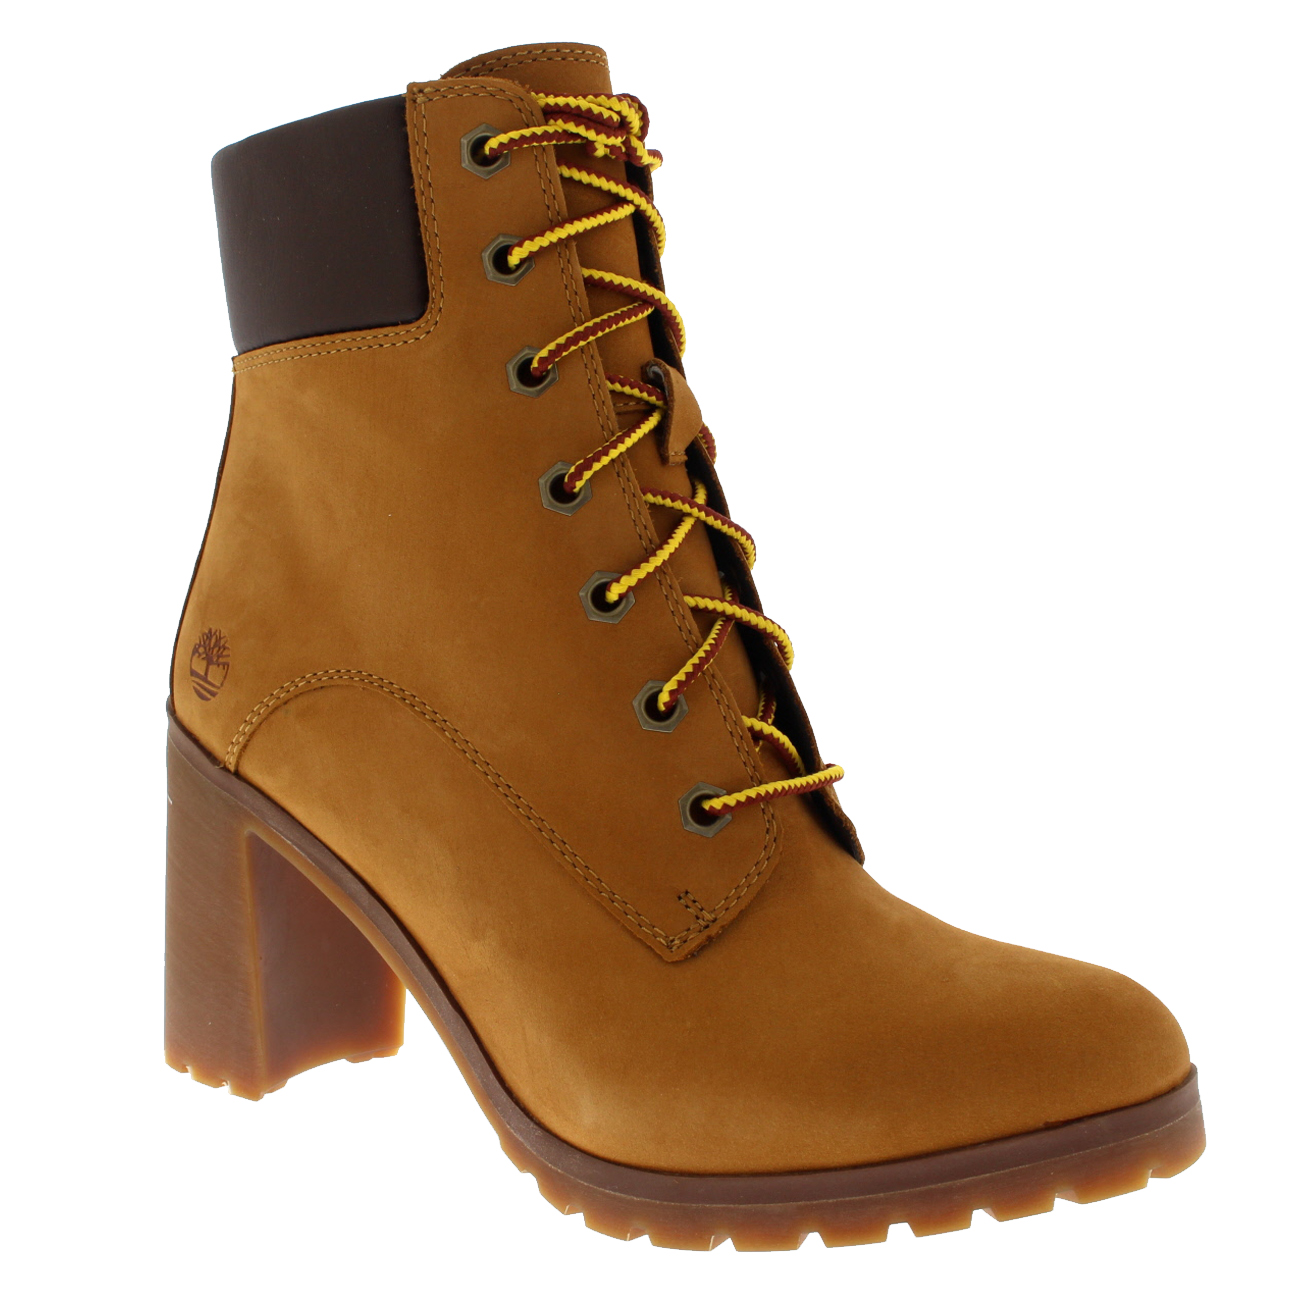 d405b5955c4 Womens Timberland Arllington 6 Inch Lace Fashion Block Heel Ankle ...